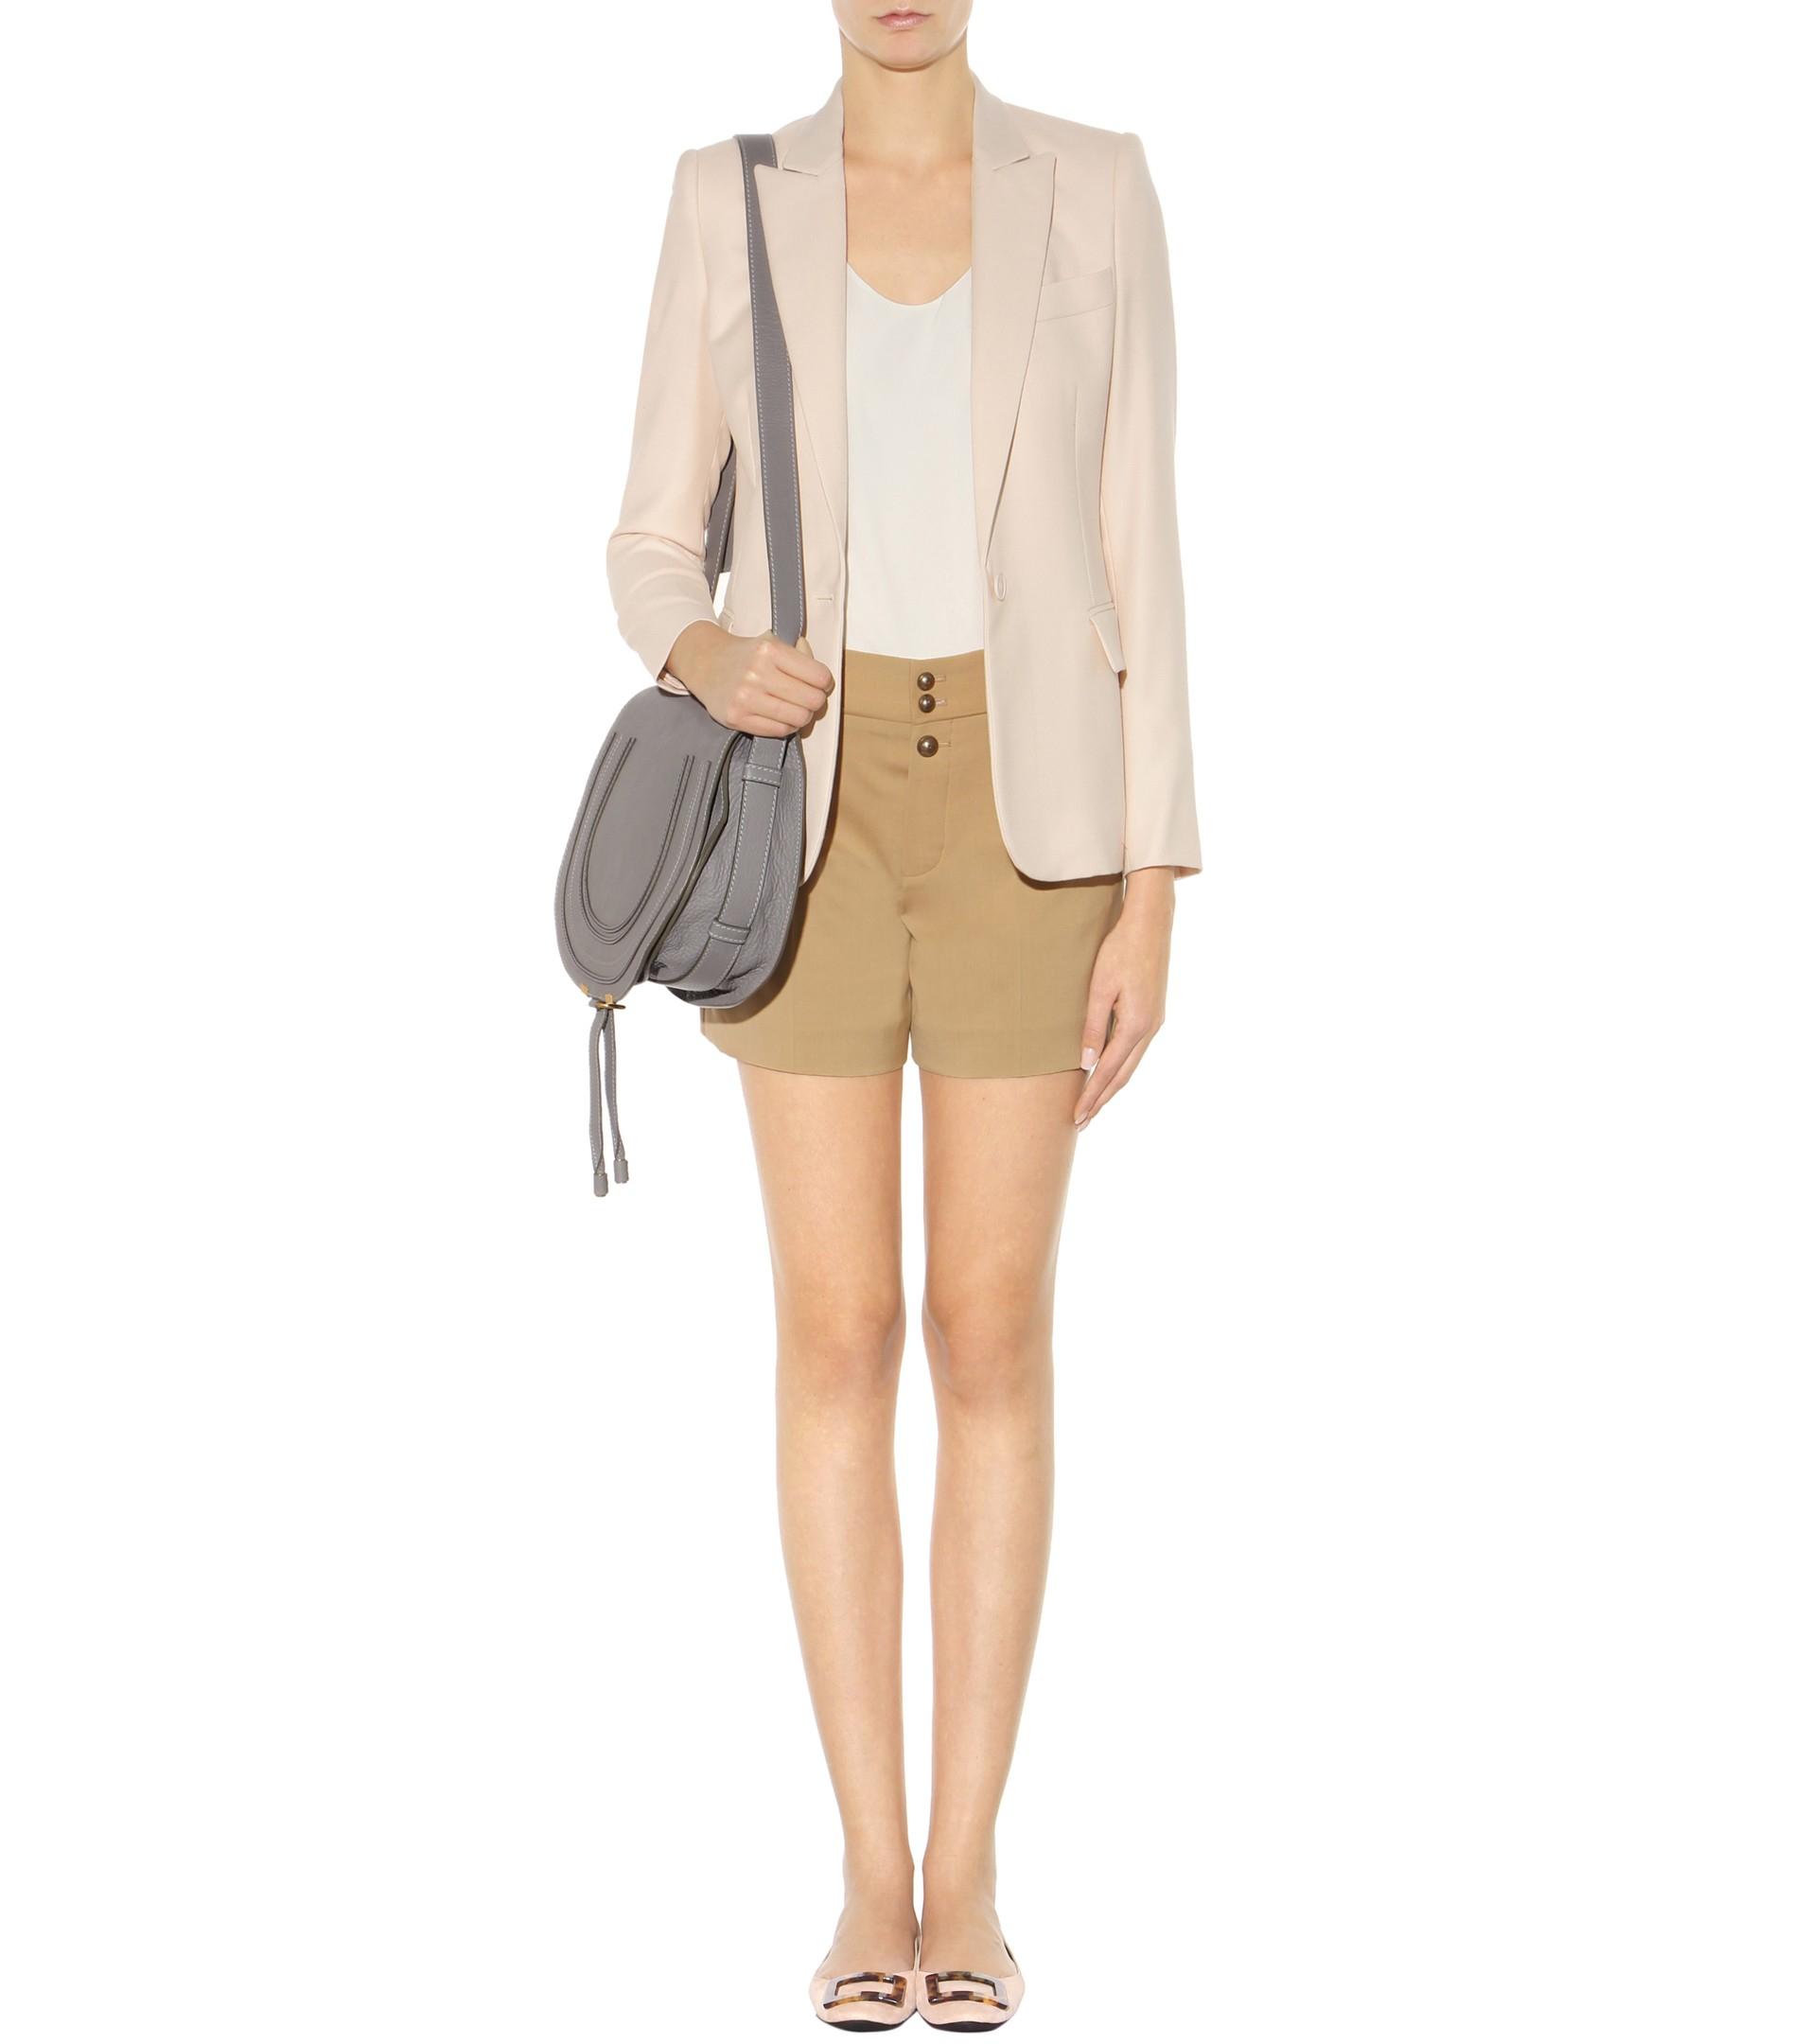 handbags see by chloe - Chlo�� Marcie Leather Crossbody Bag in Gray (Cashmere Grey) | Lyst